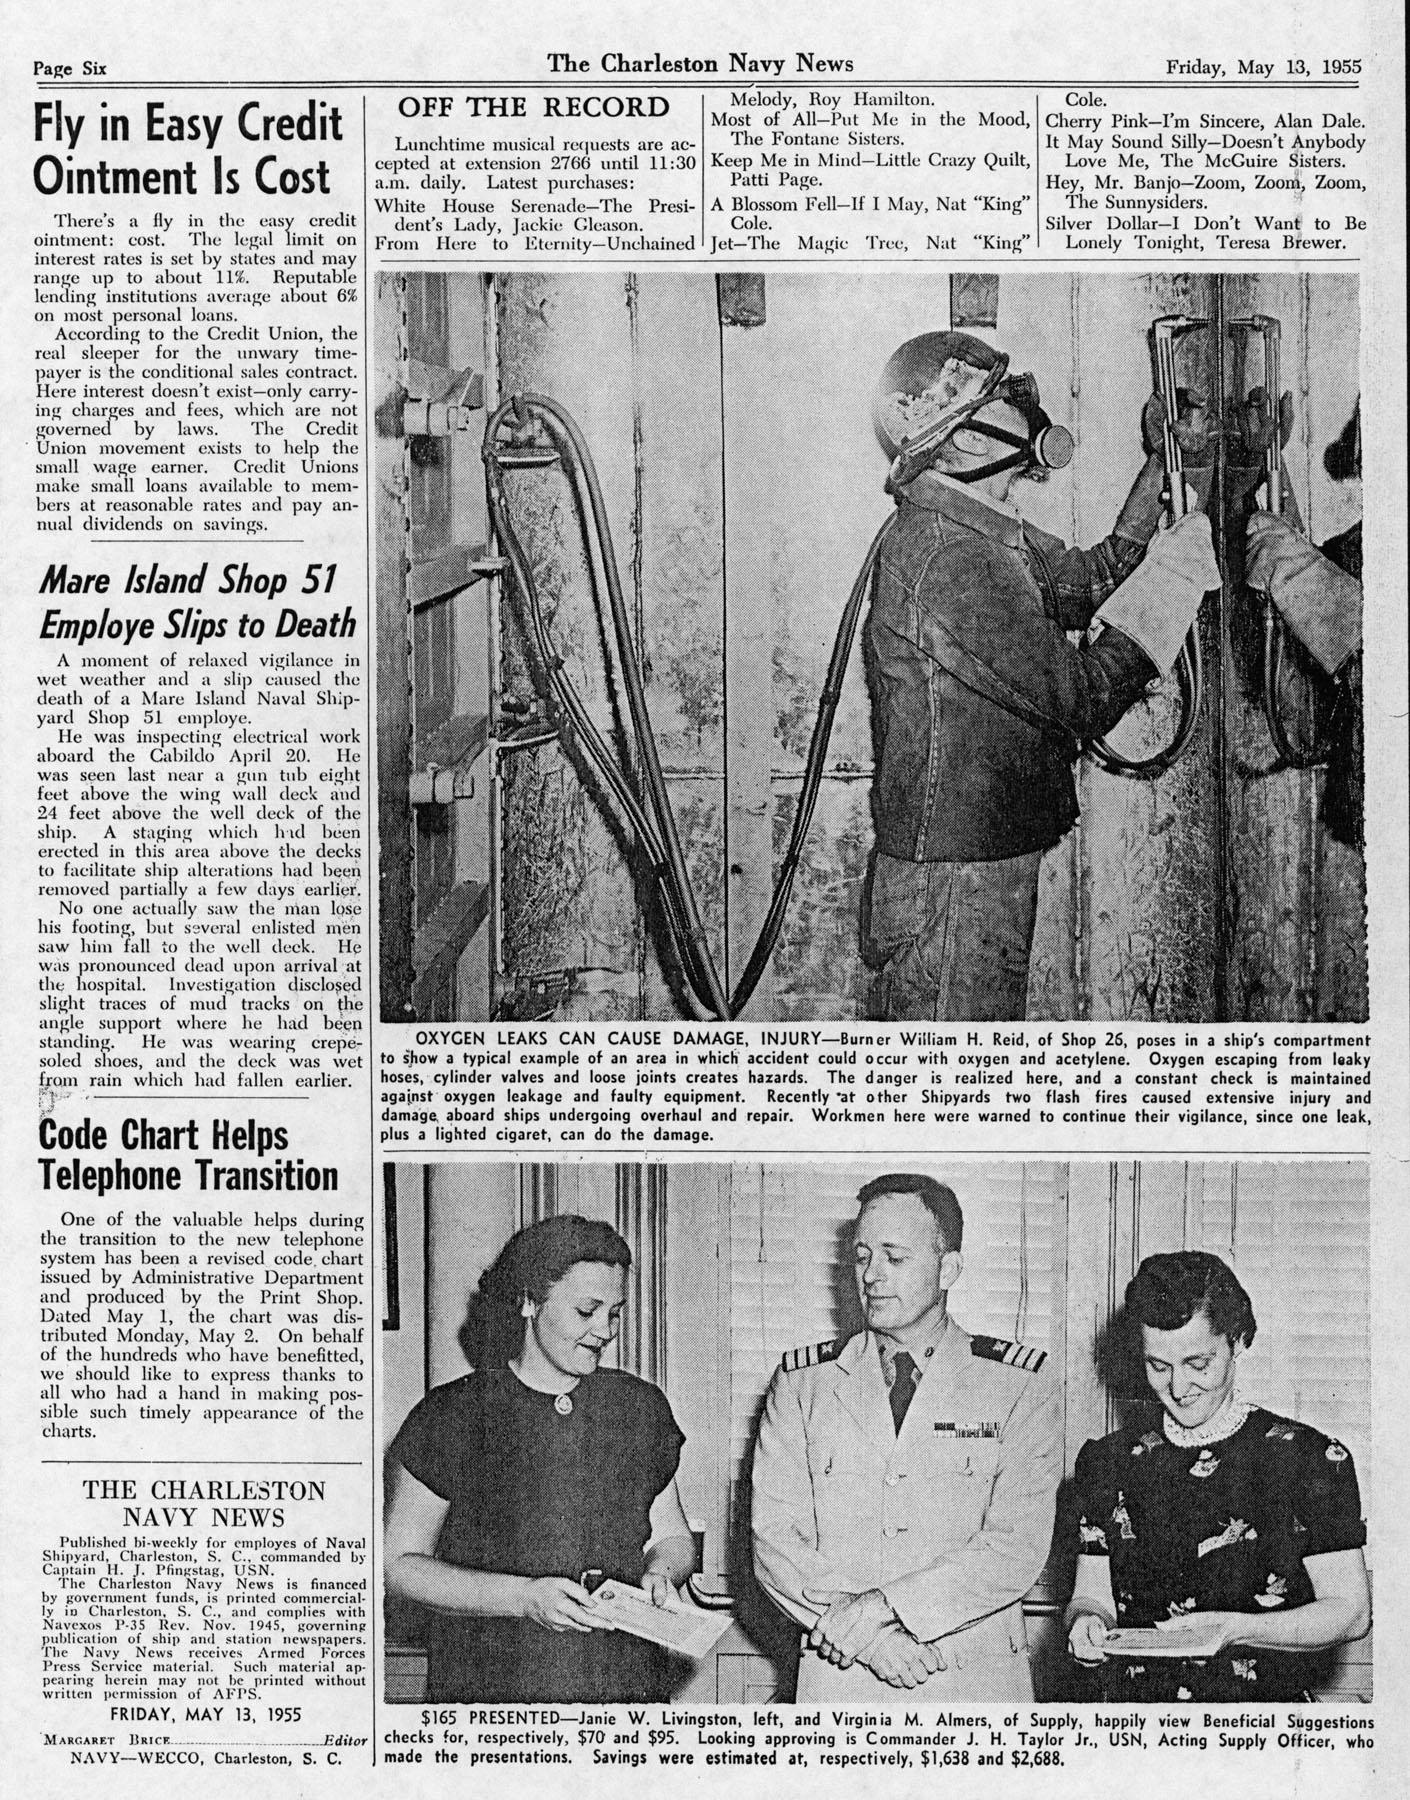 The Charleston Navy News, Volume 13, Edition 22, page vi